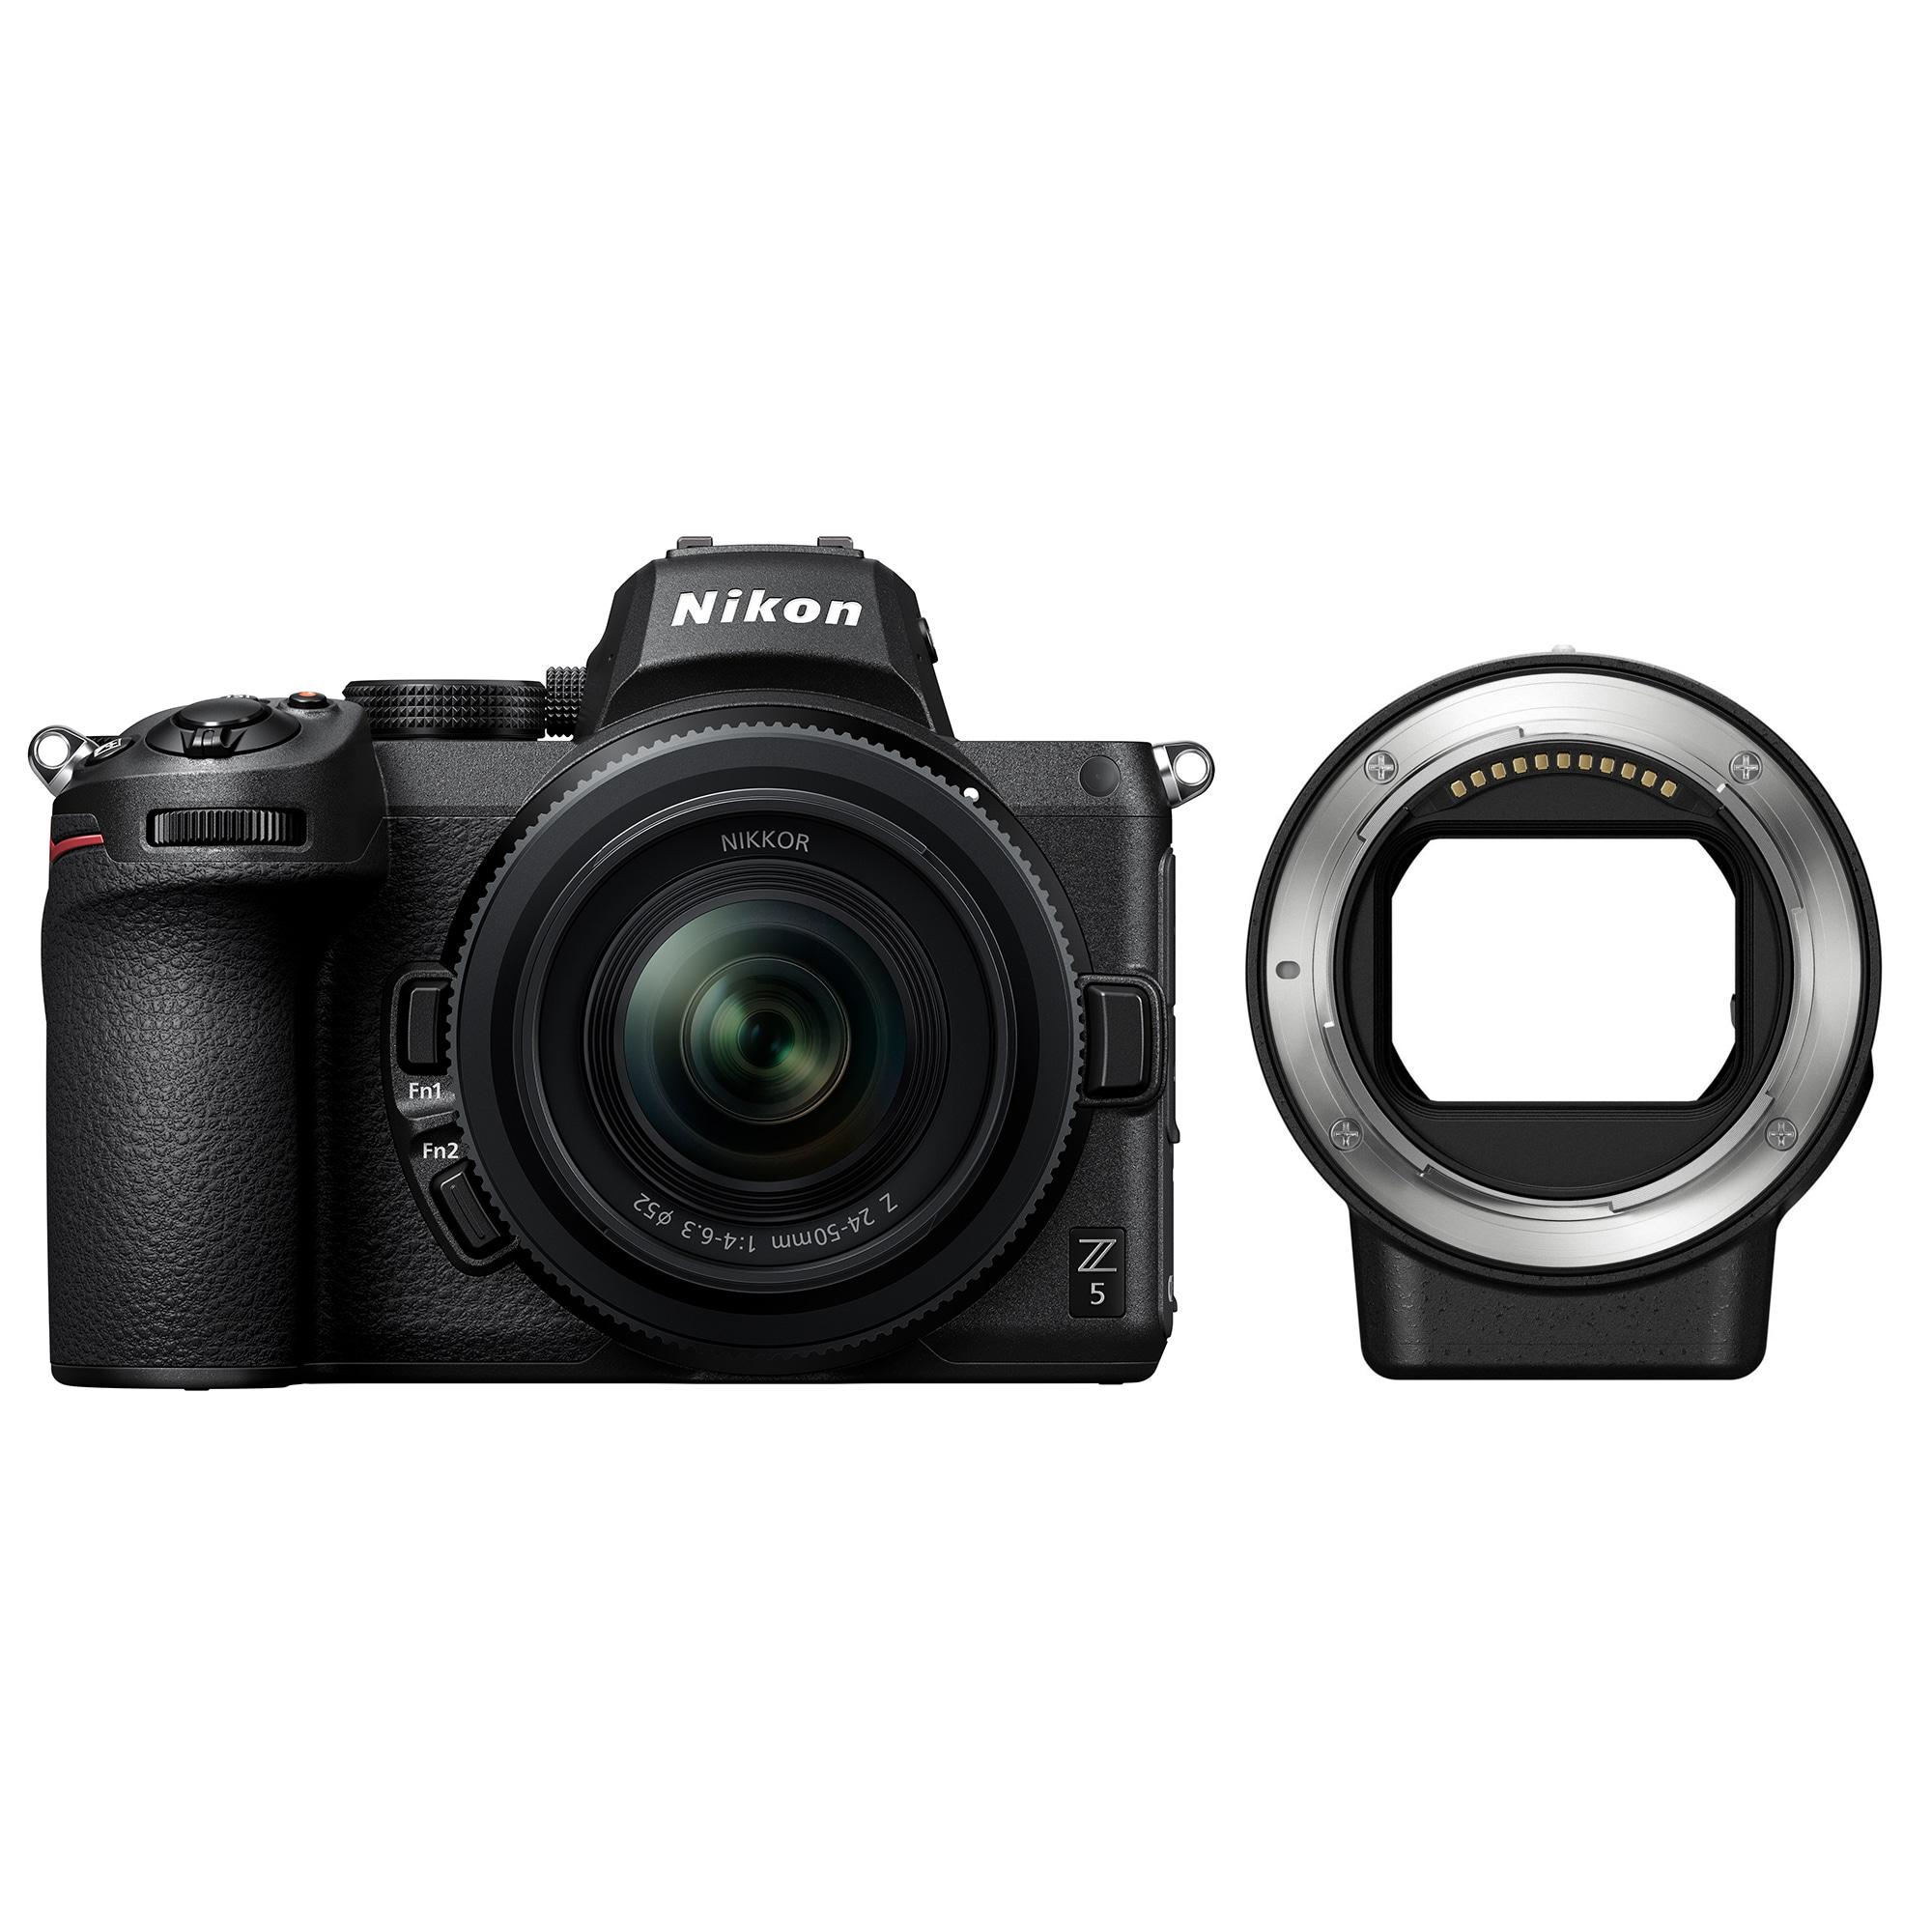 Nikon Z5 + NIKKOR Z 24-50mm f/4-6.3 + Mount Adapter FTZ